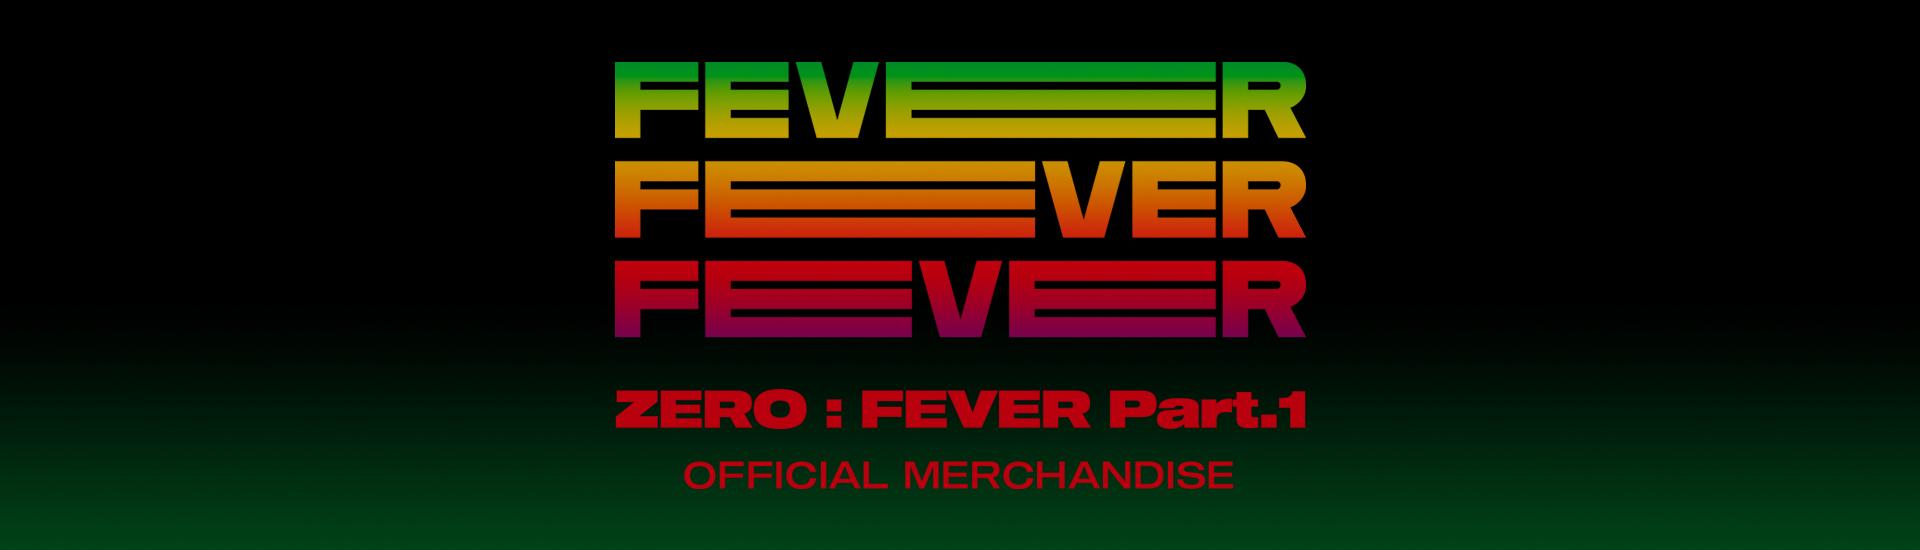 ATEEZ - ZERO : FEVER Part.1 OFFICIAL MERCHANDISE (APPARELS)